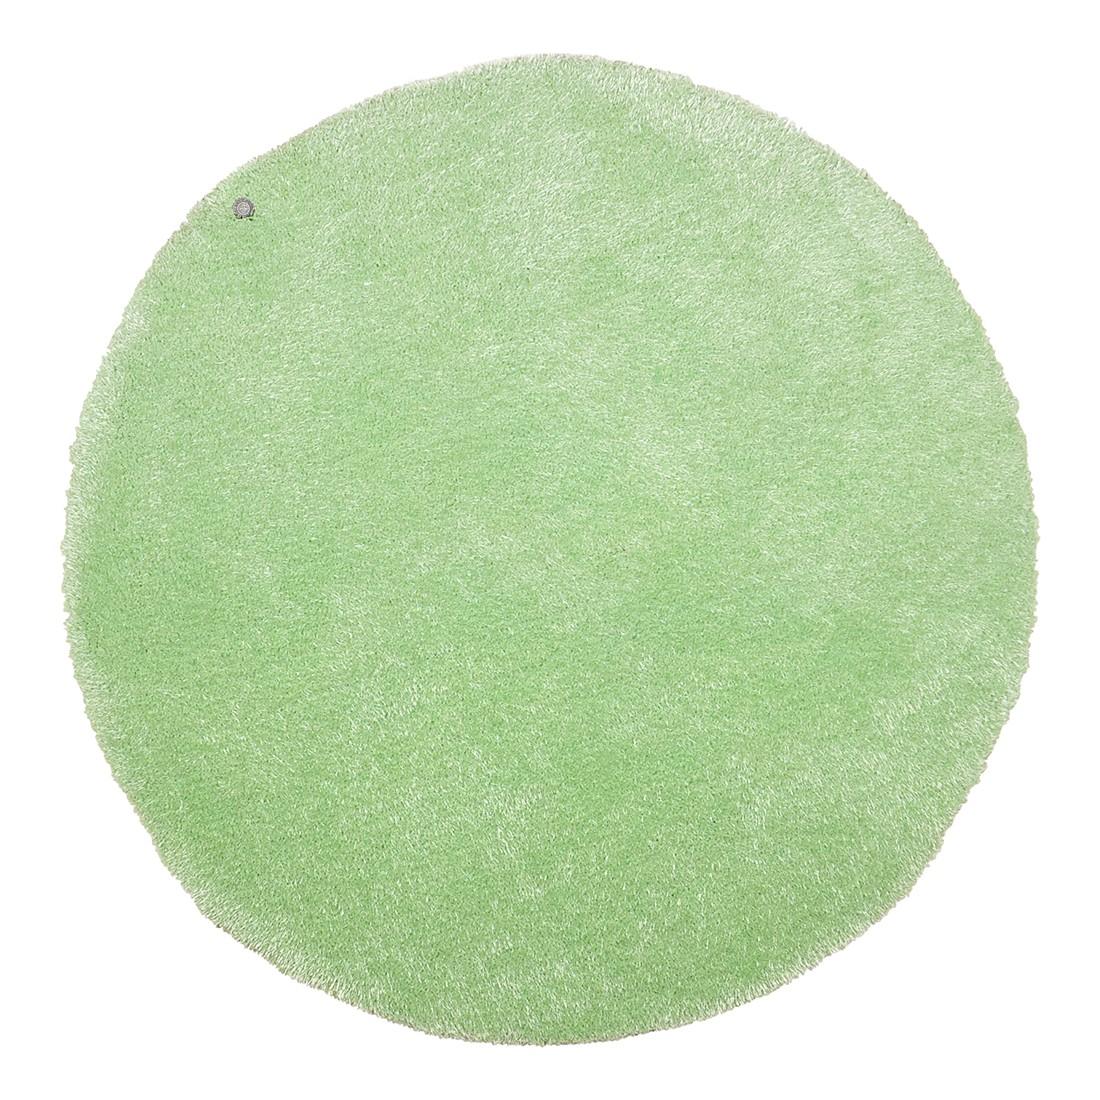 Image of Tappeto Soft Round - Verde menta - Dimensioni: 140 x 140 cm, Tom Tailor